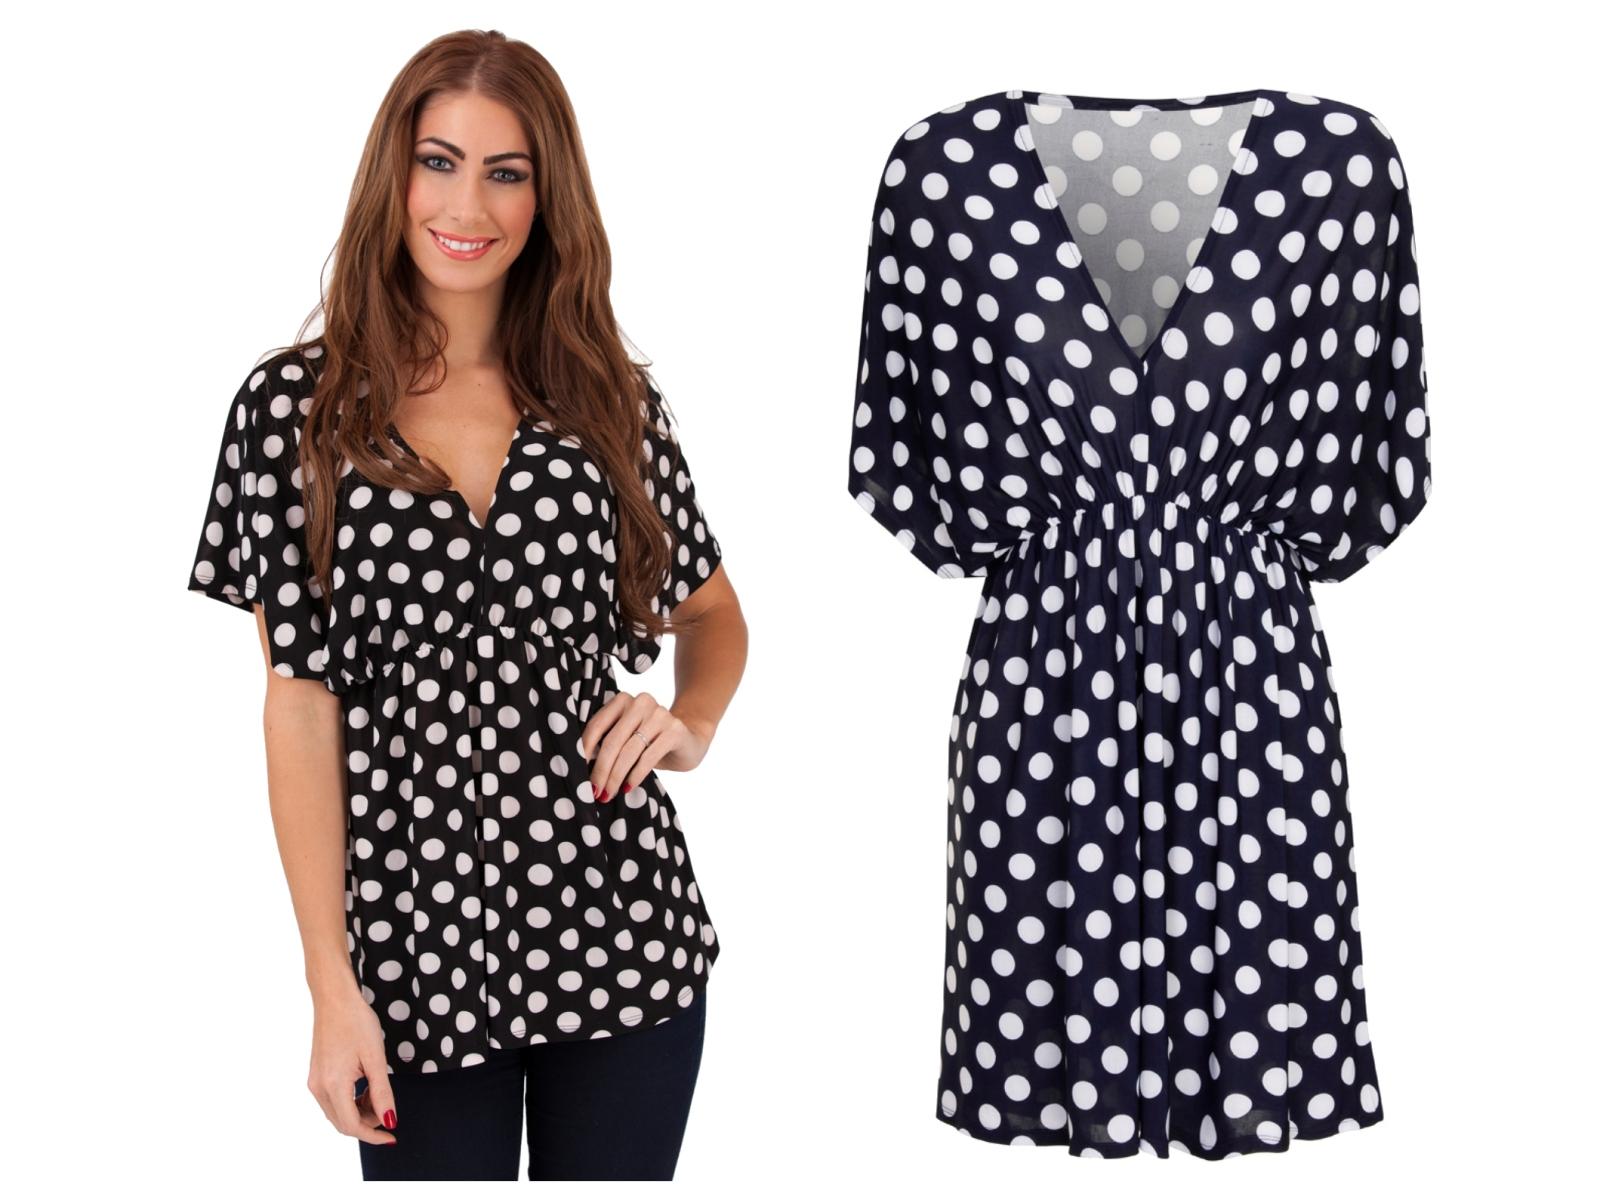 7d77699ac7c6 Womens Polka Dot V Neck Short Sleeved Blouse Stretch Summer Top Ladies UK 8- 16